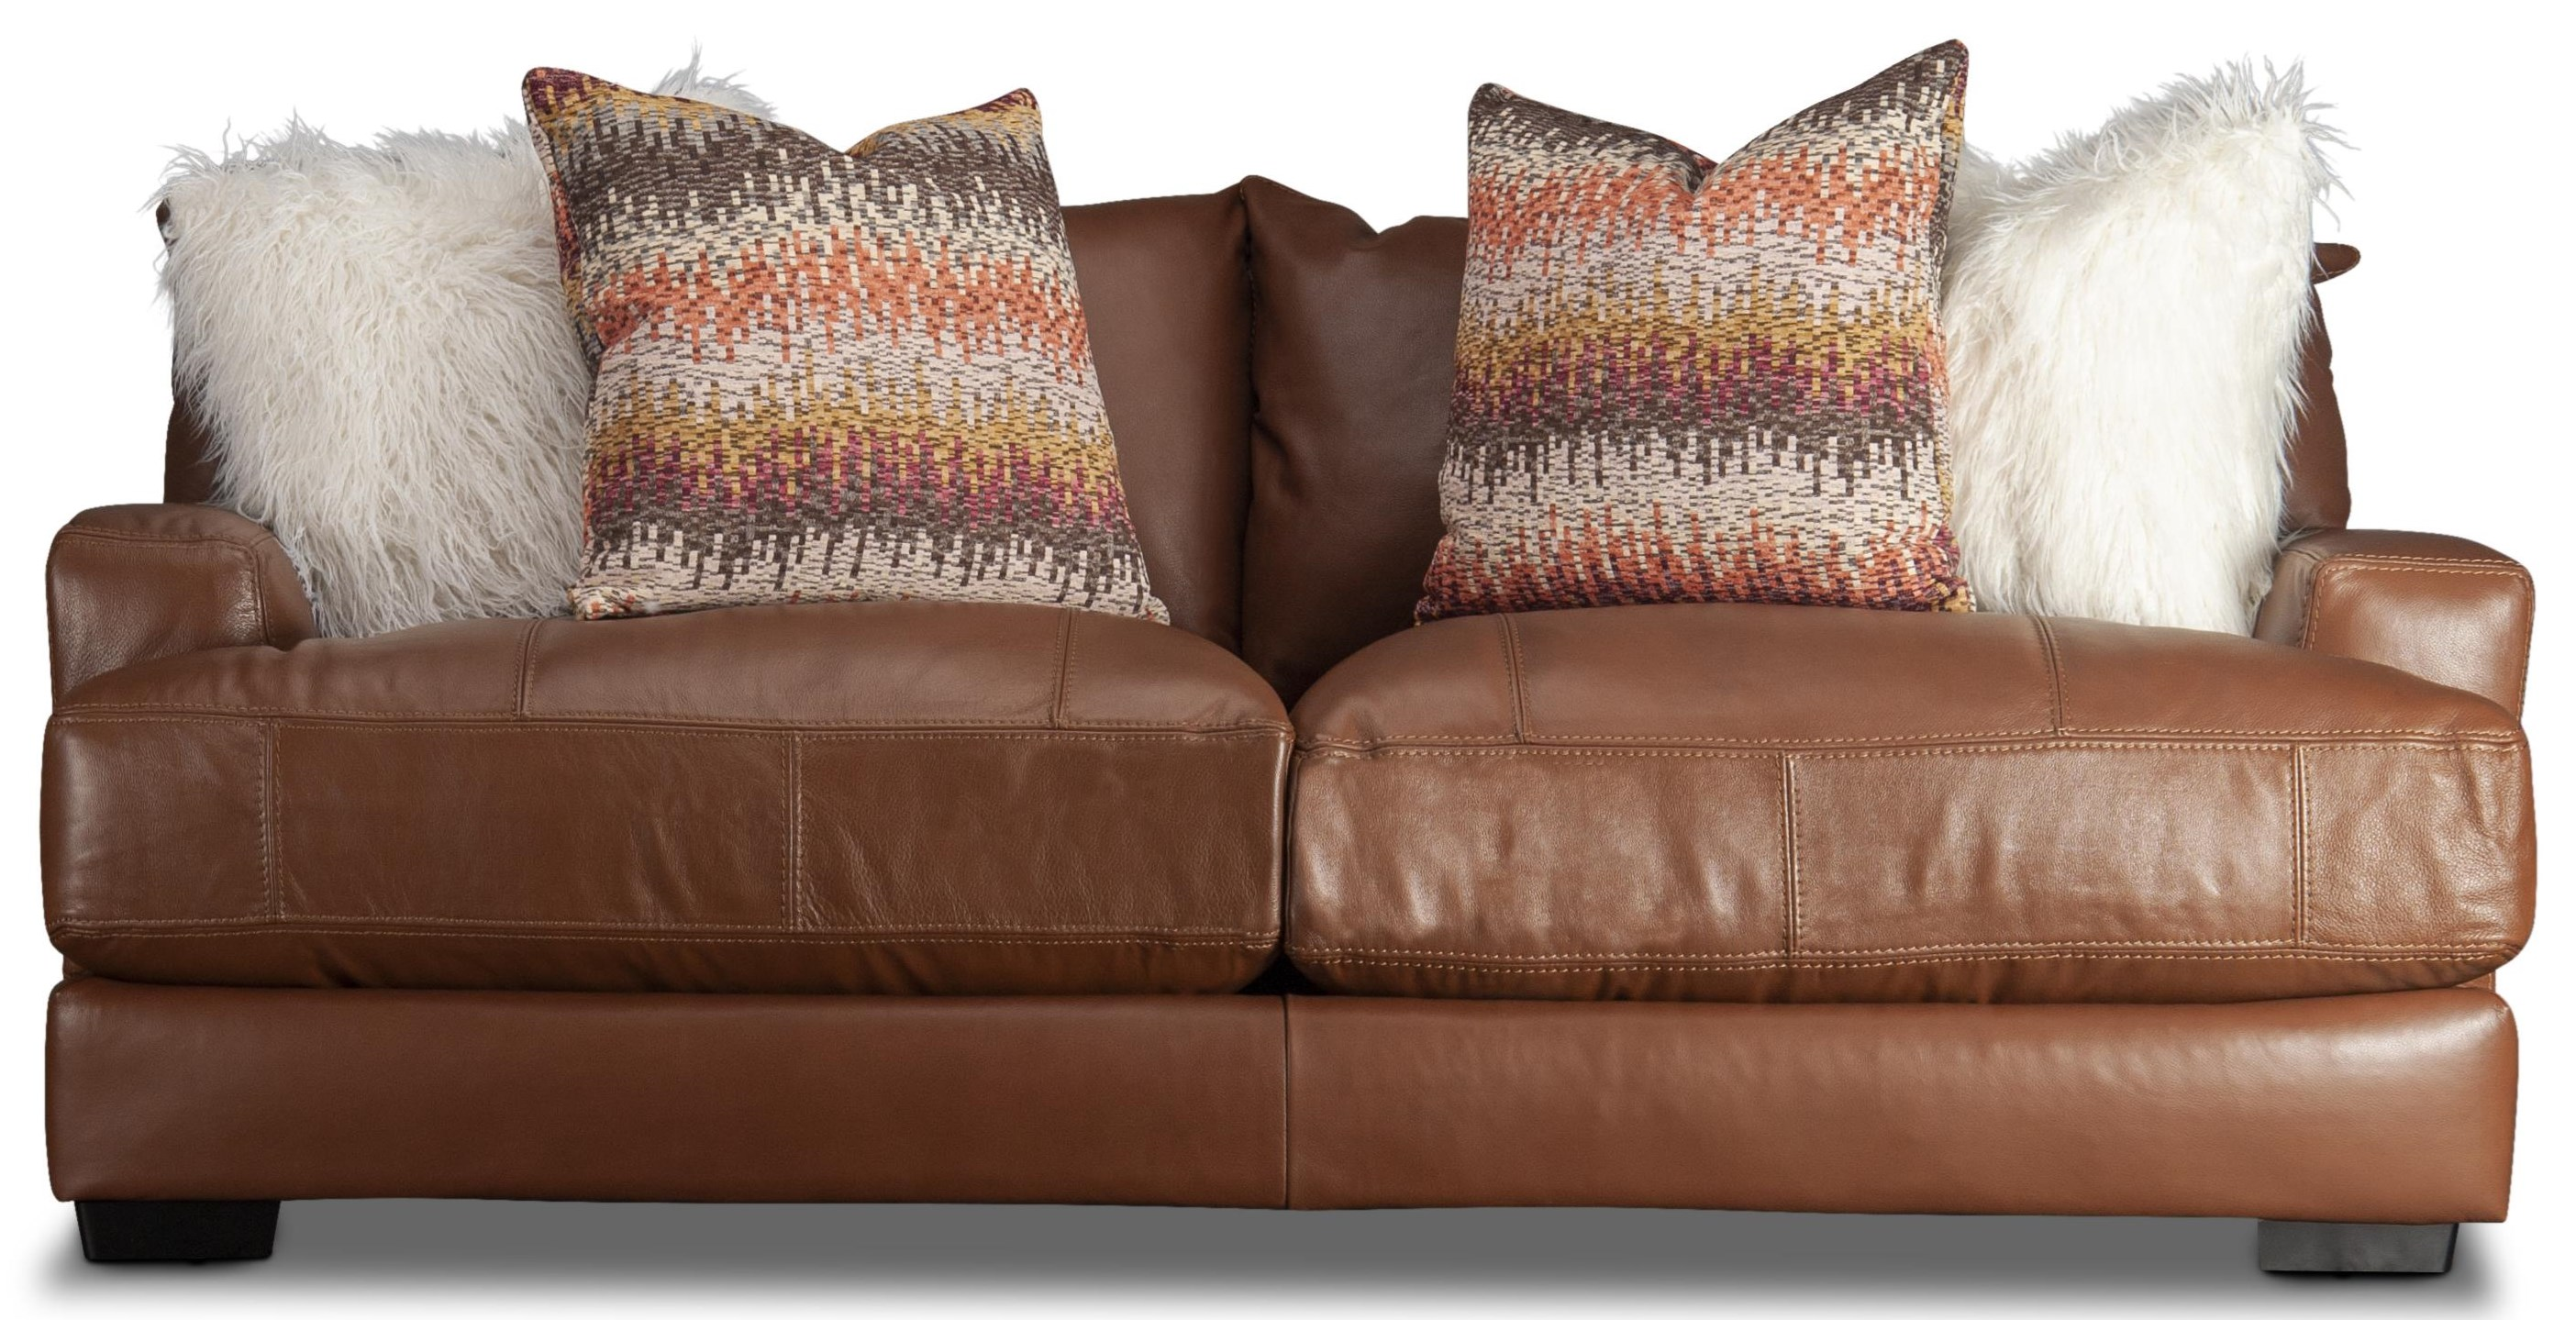 Blair Blair Leather Match Sofa by Franklin at Morris Home